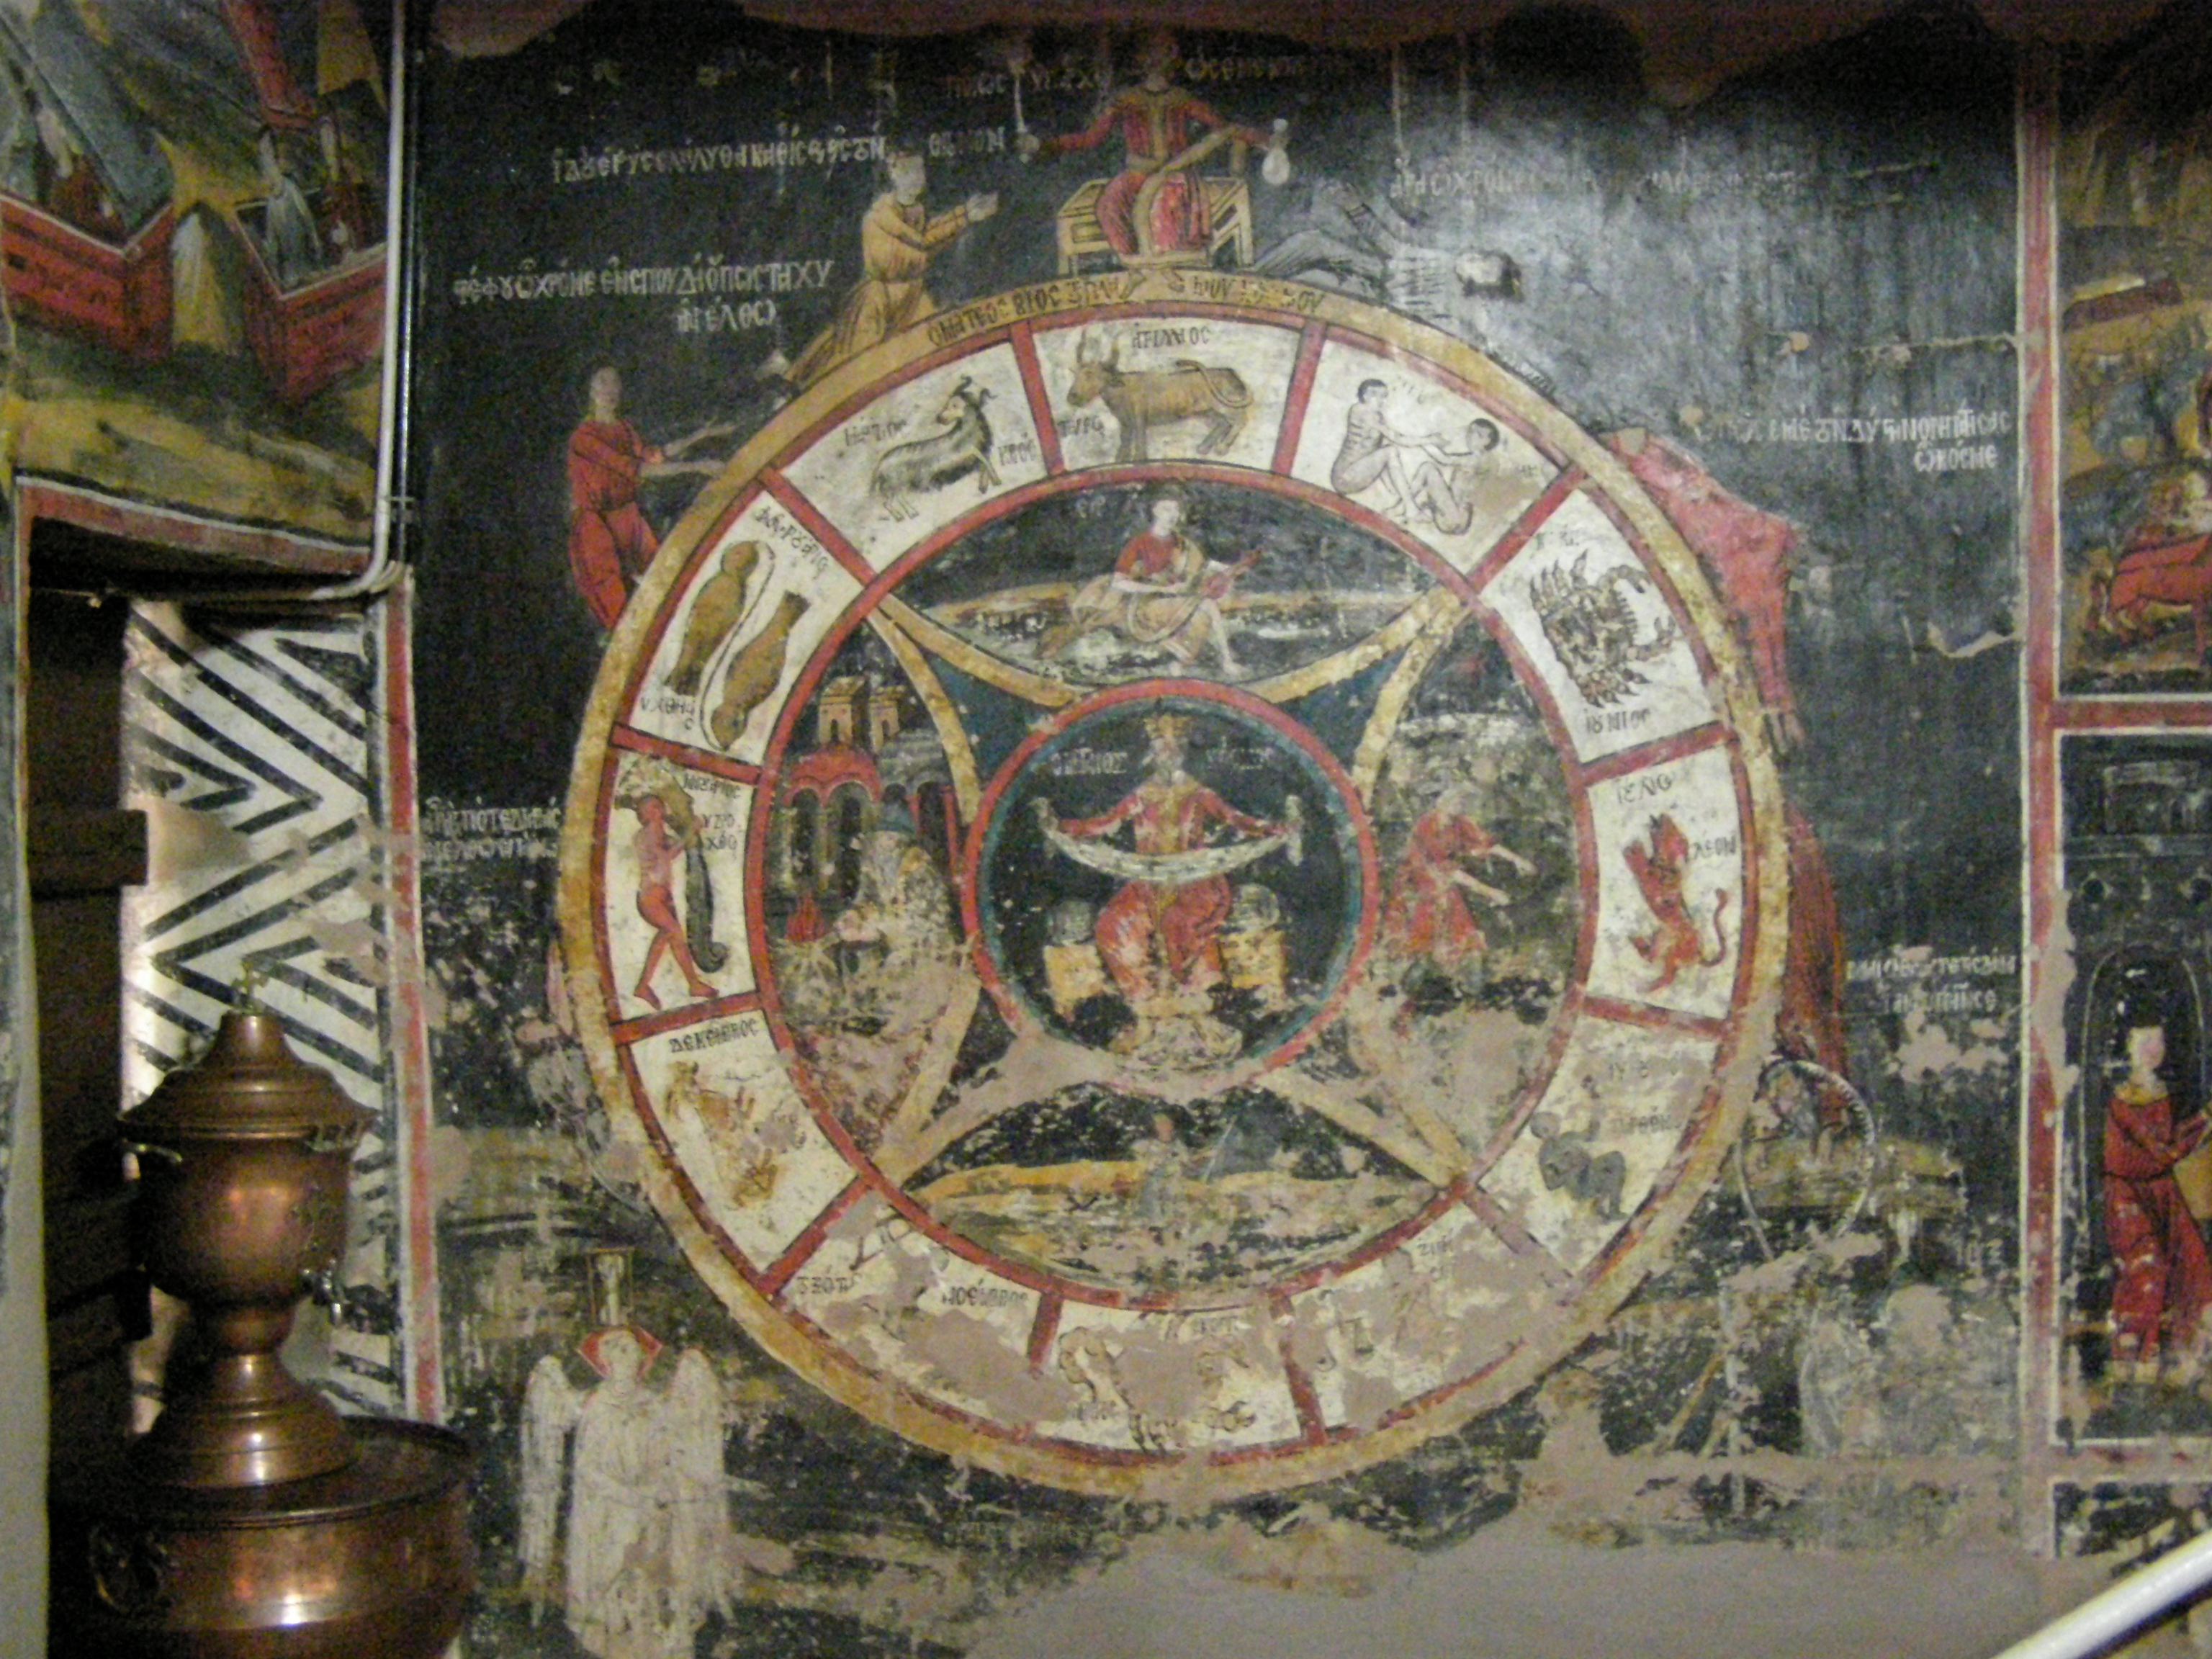 ancient astronomy symbols - HD2048×1536